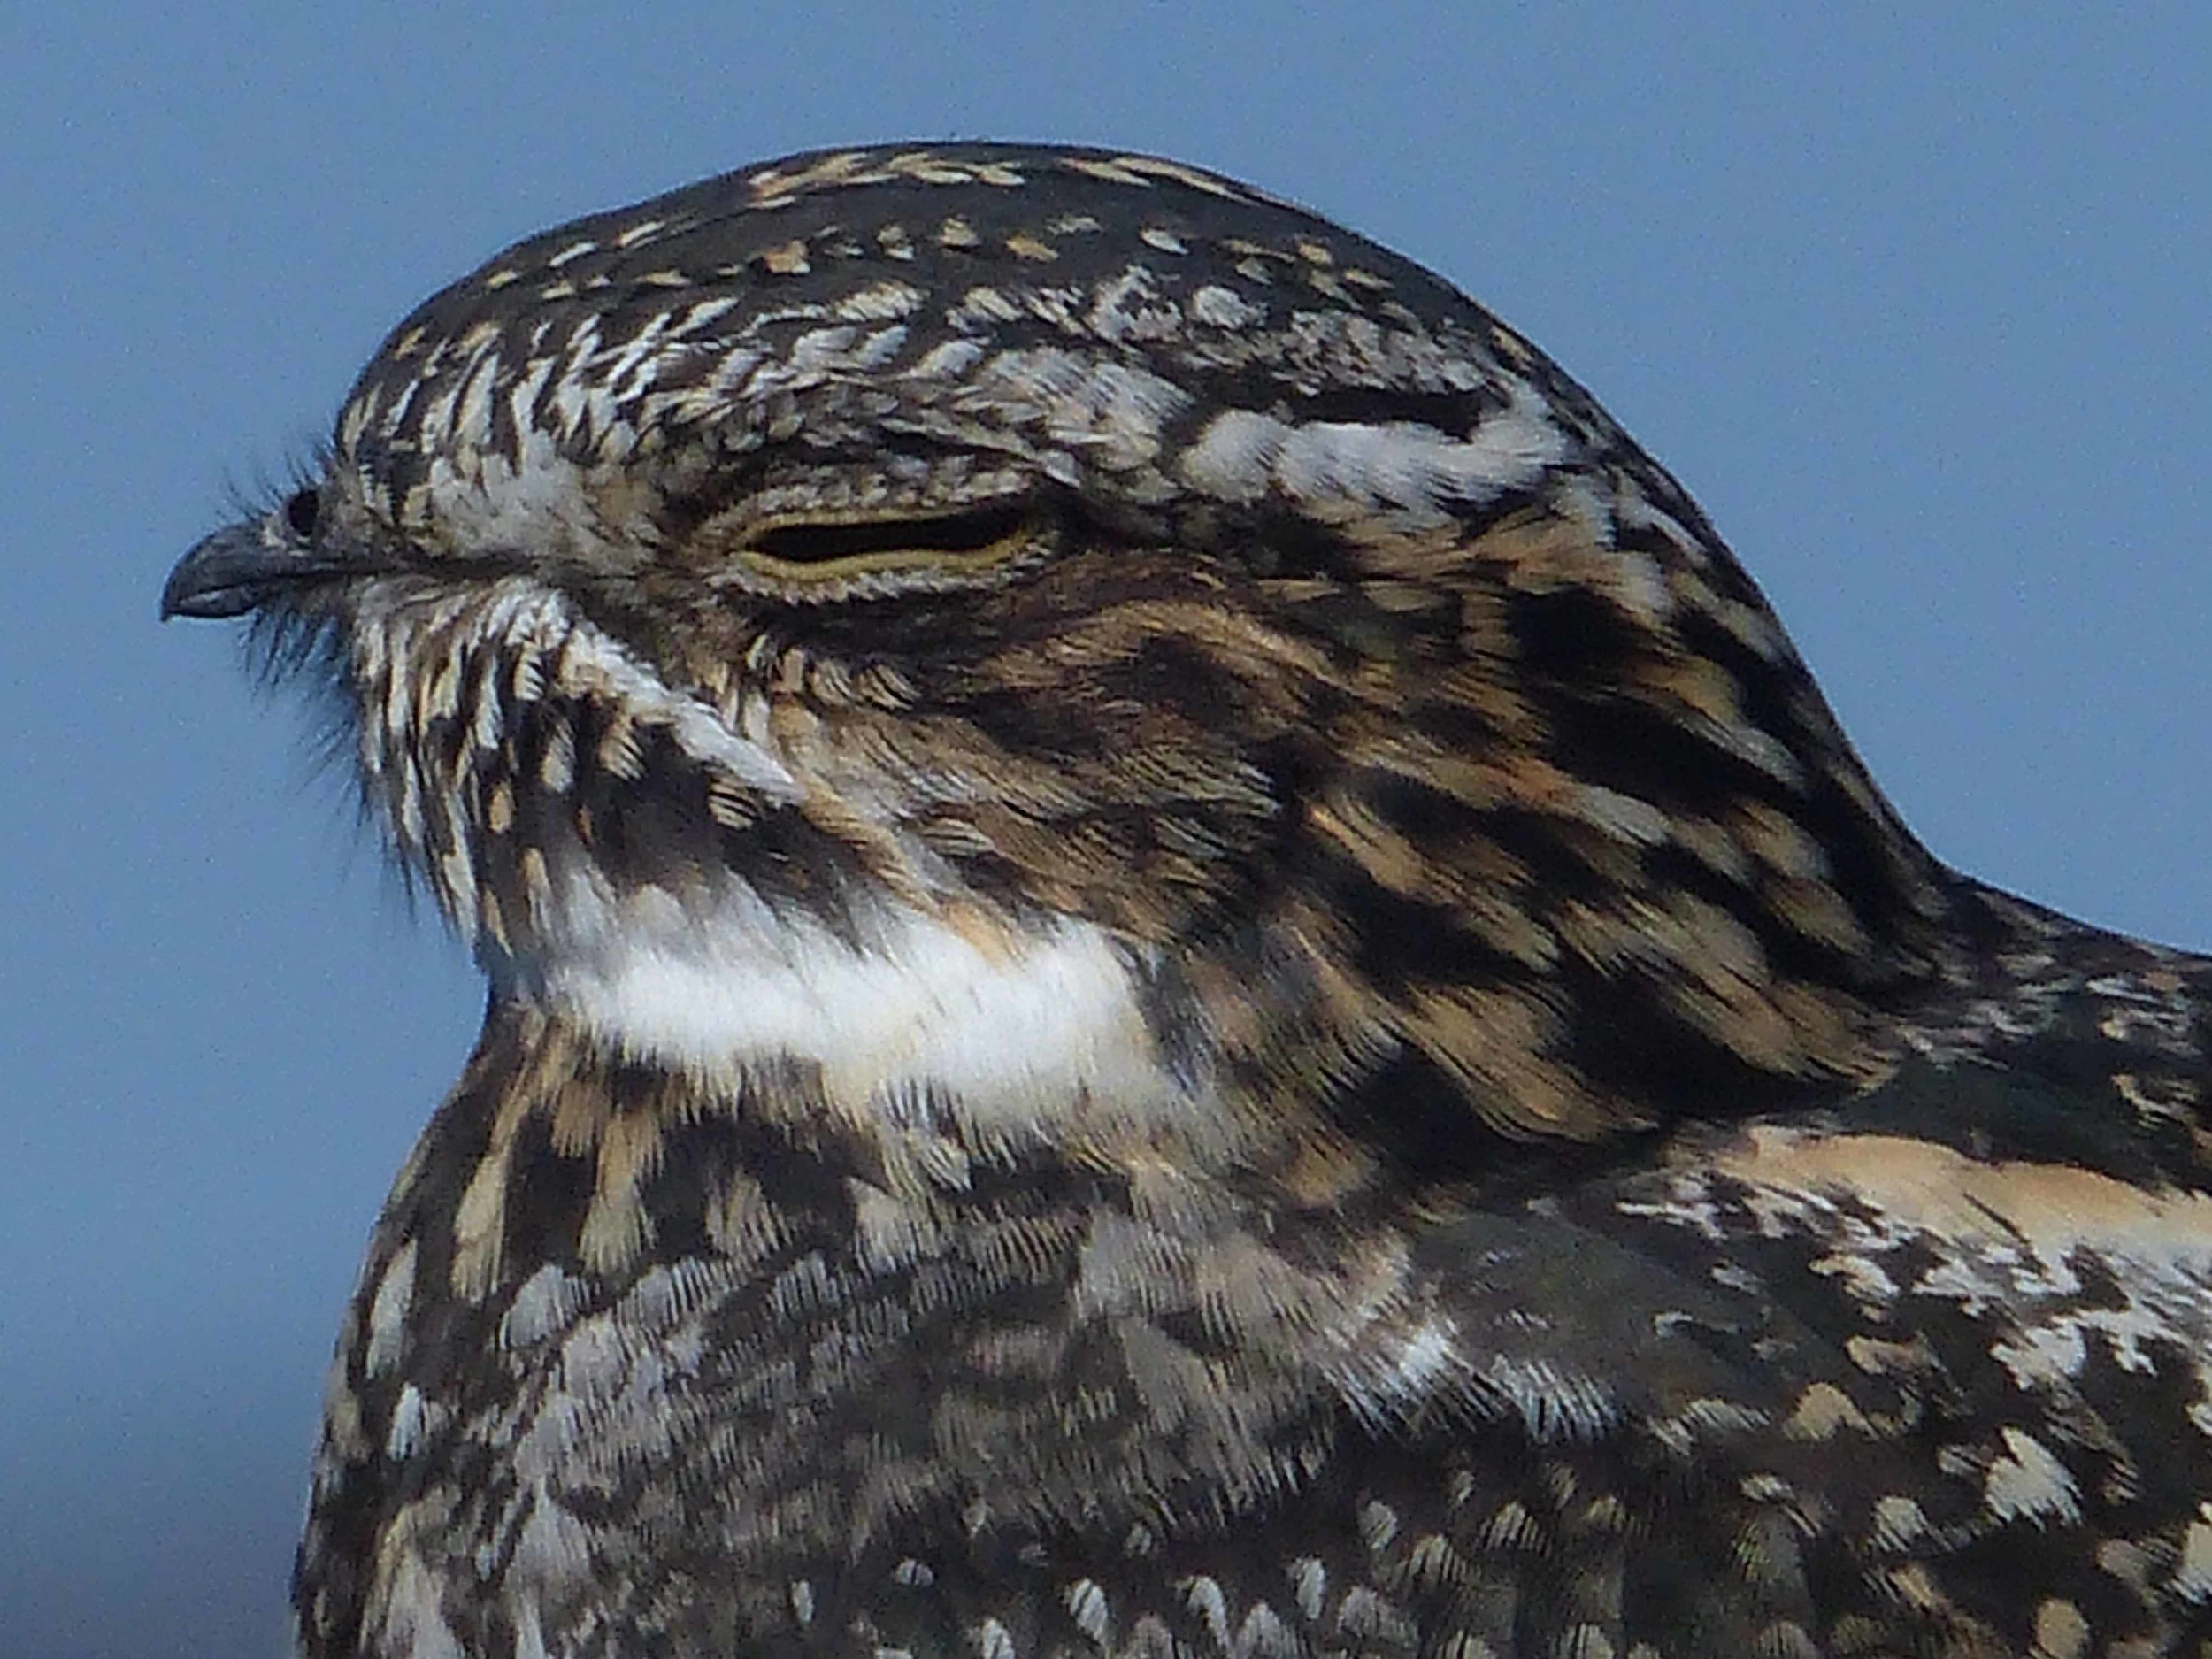 bcn P1160089 Common Nighthawk head.jpg